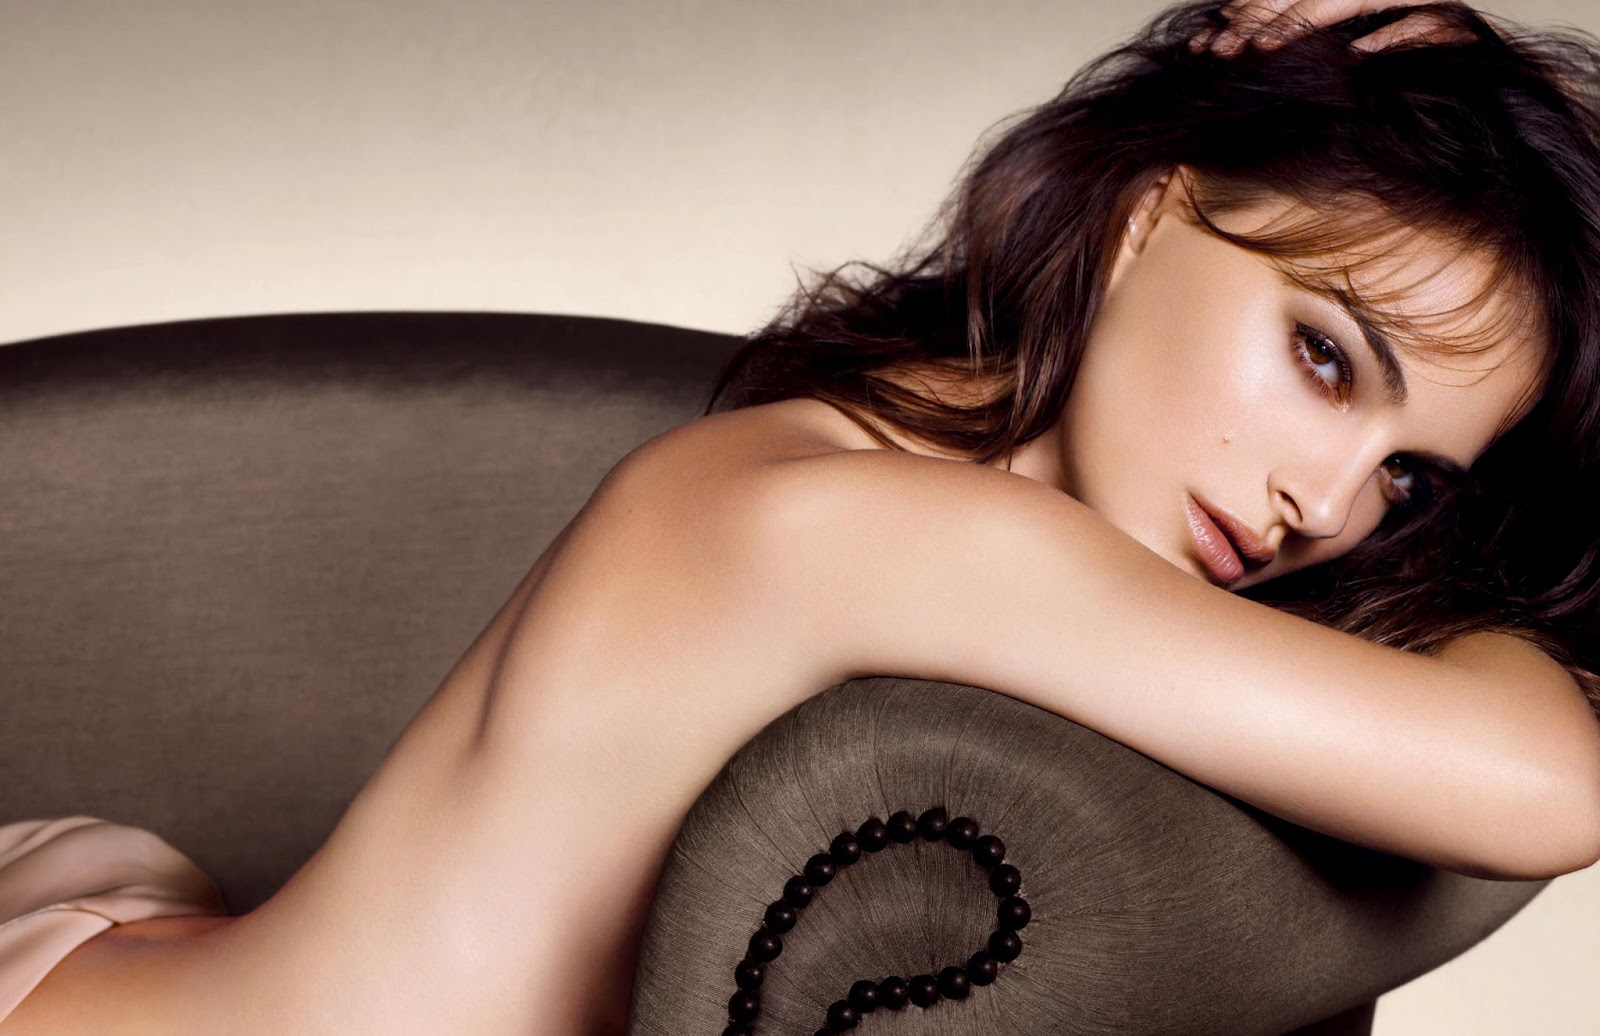 http://3.bp.blogspot.com/-lXobNlqGZVU/UCLas4RmRRI/AAAAAAAADWY/ONmQBoW5Sk8/s1600/natalie+portman+nude+hot+sexy.jpg